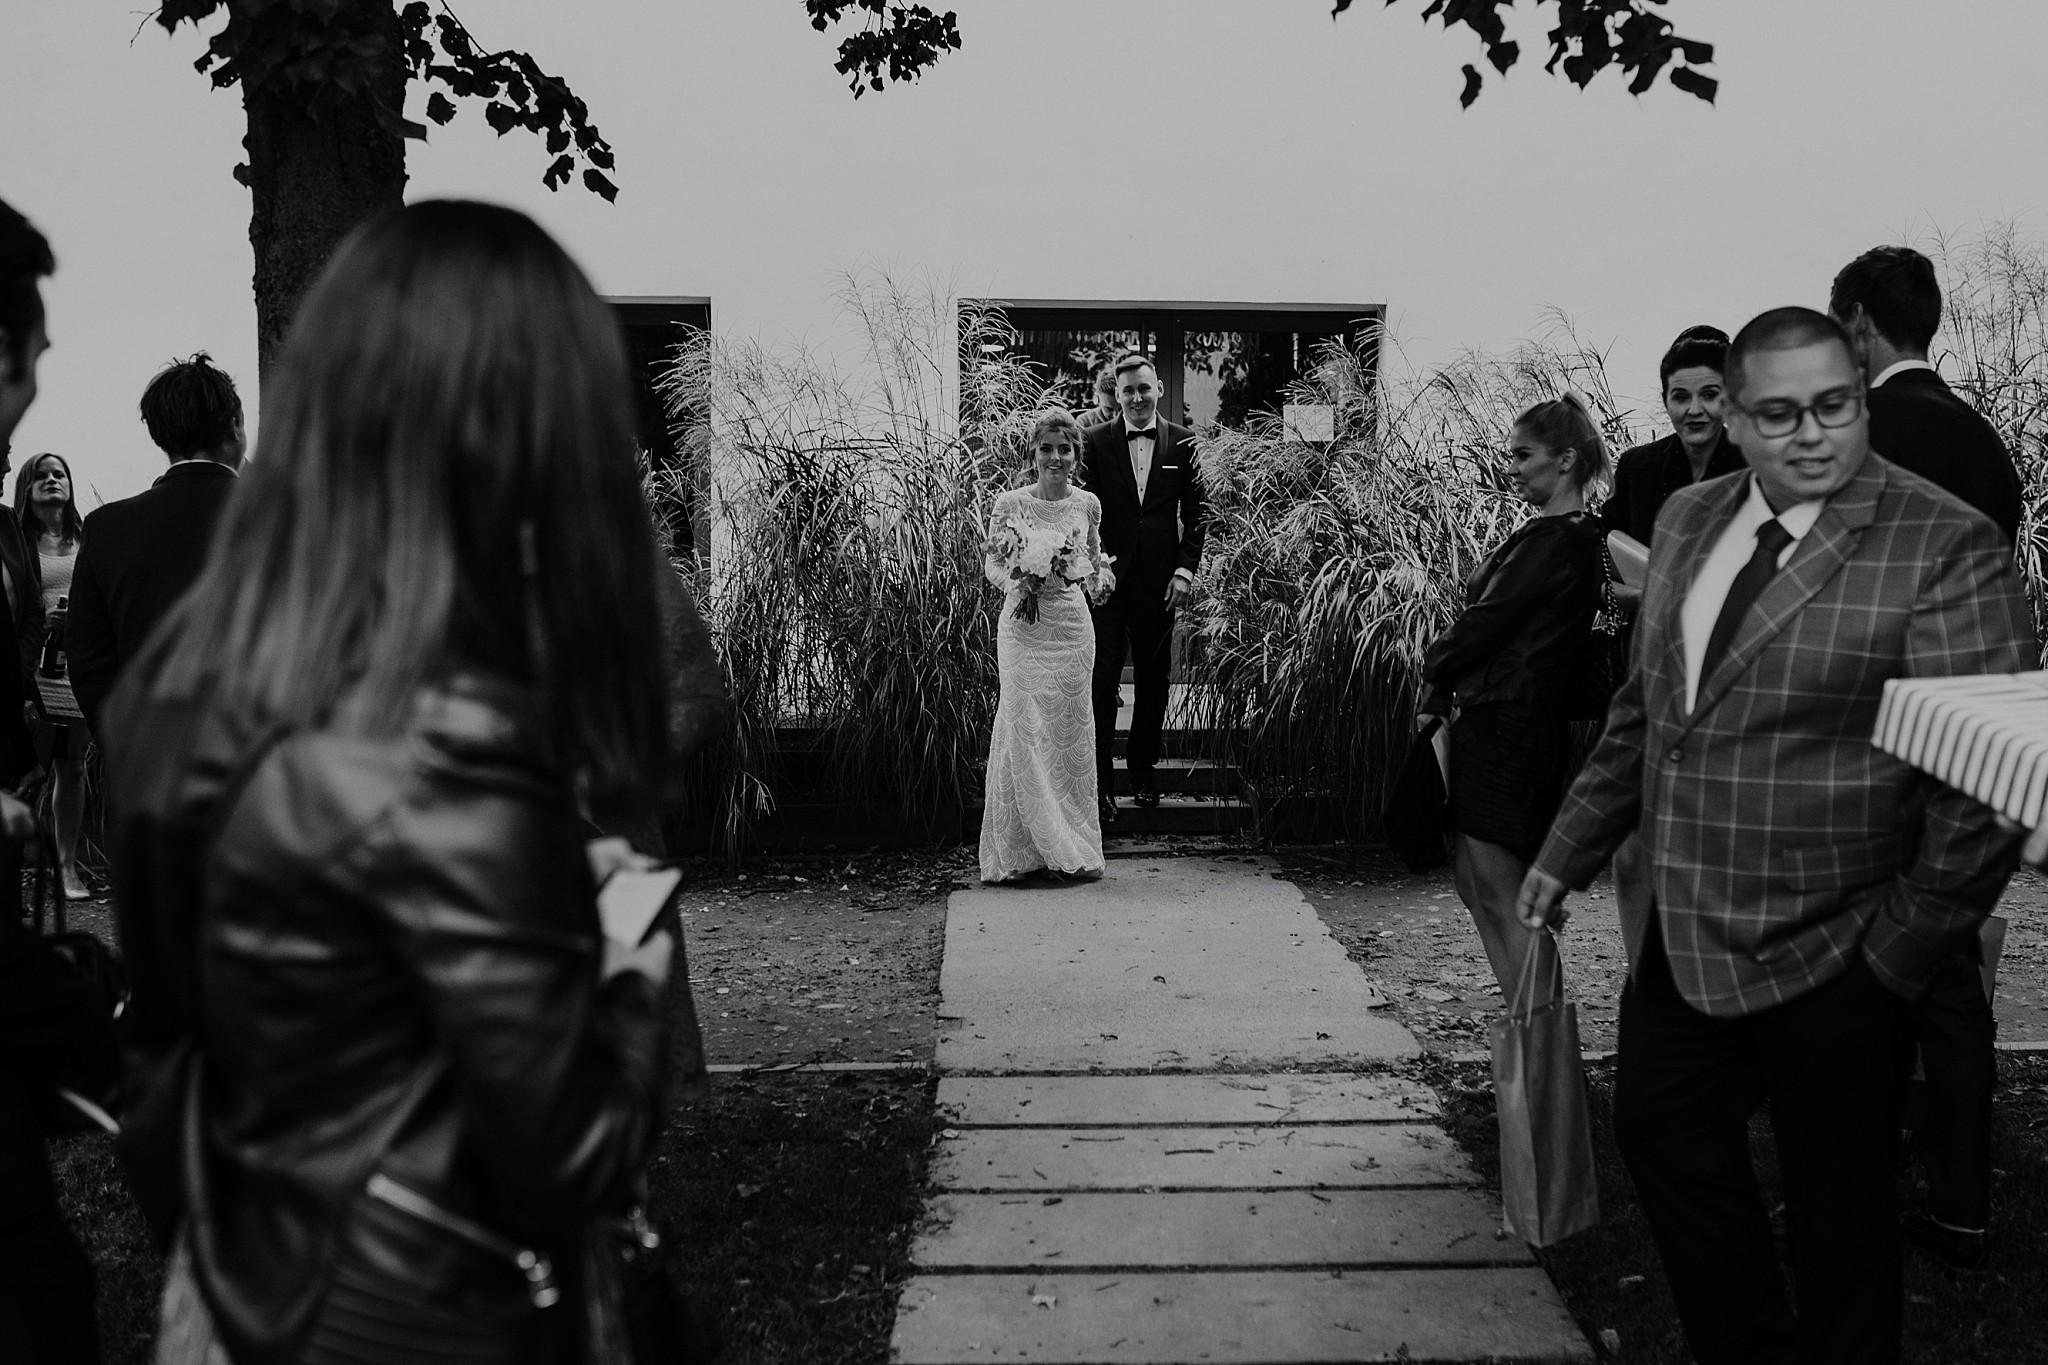 fotograf poznan wesele dobra truskawka piekne wesele pod poznaniem wesele w dobrej truskawce piekna para mloda slub marzen slub koronawirus slub listopad wesele koronawirus 258